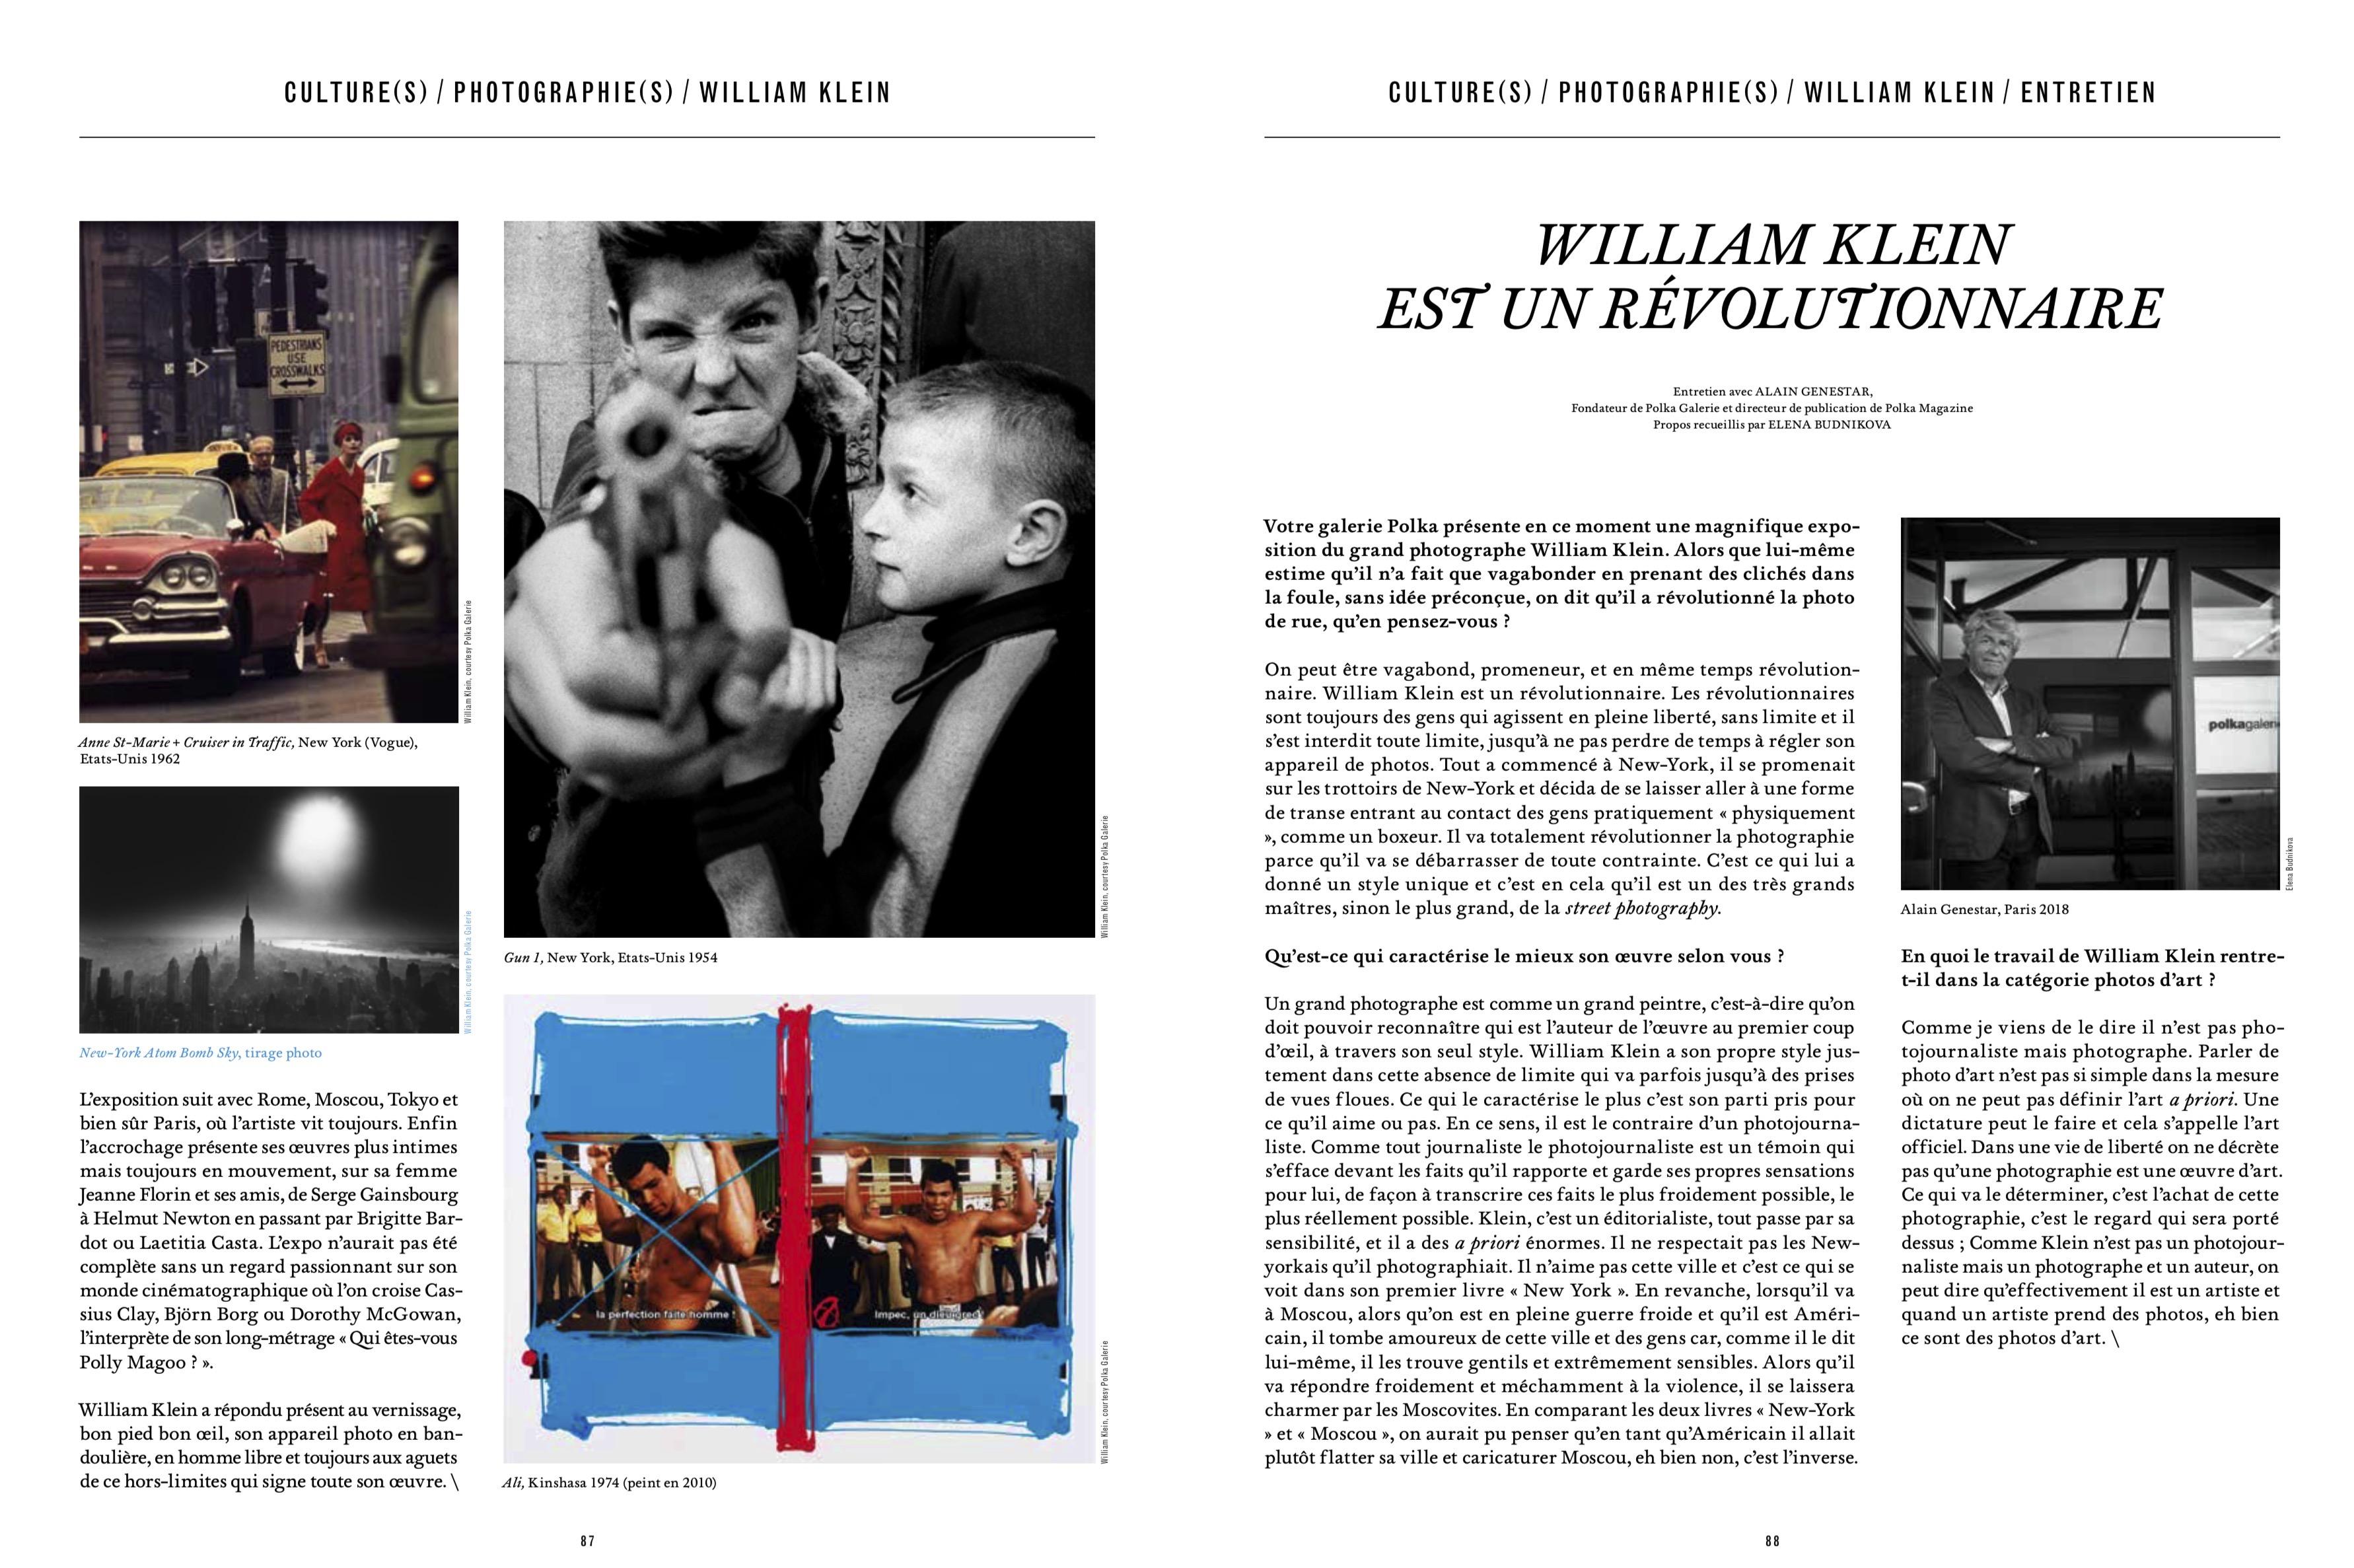 Magazine Market № 142, Geneva.Interview and portrait of Alain Genestar